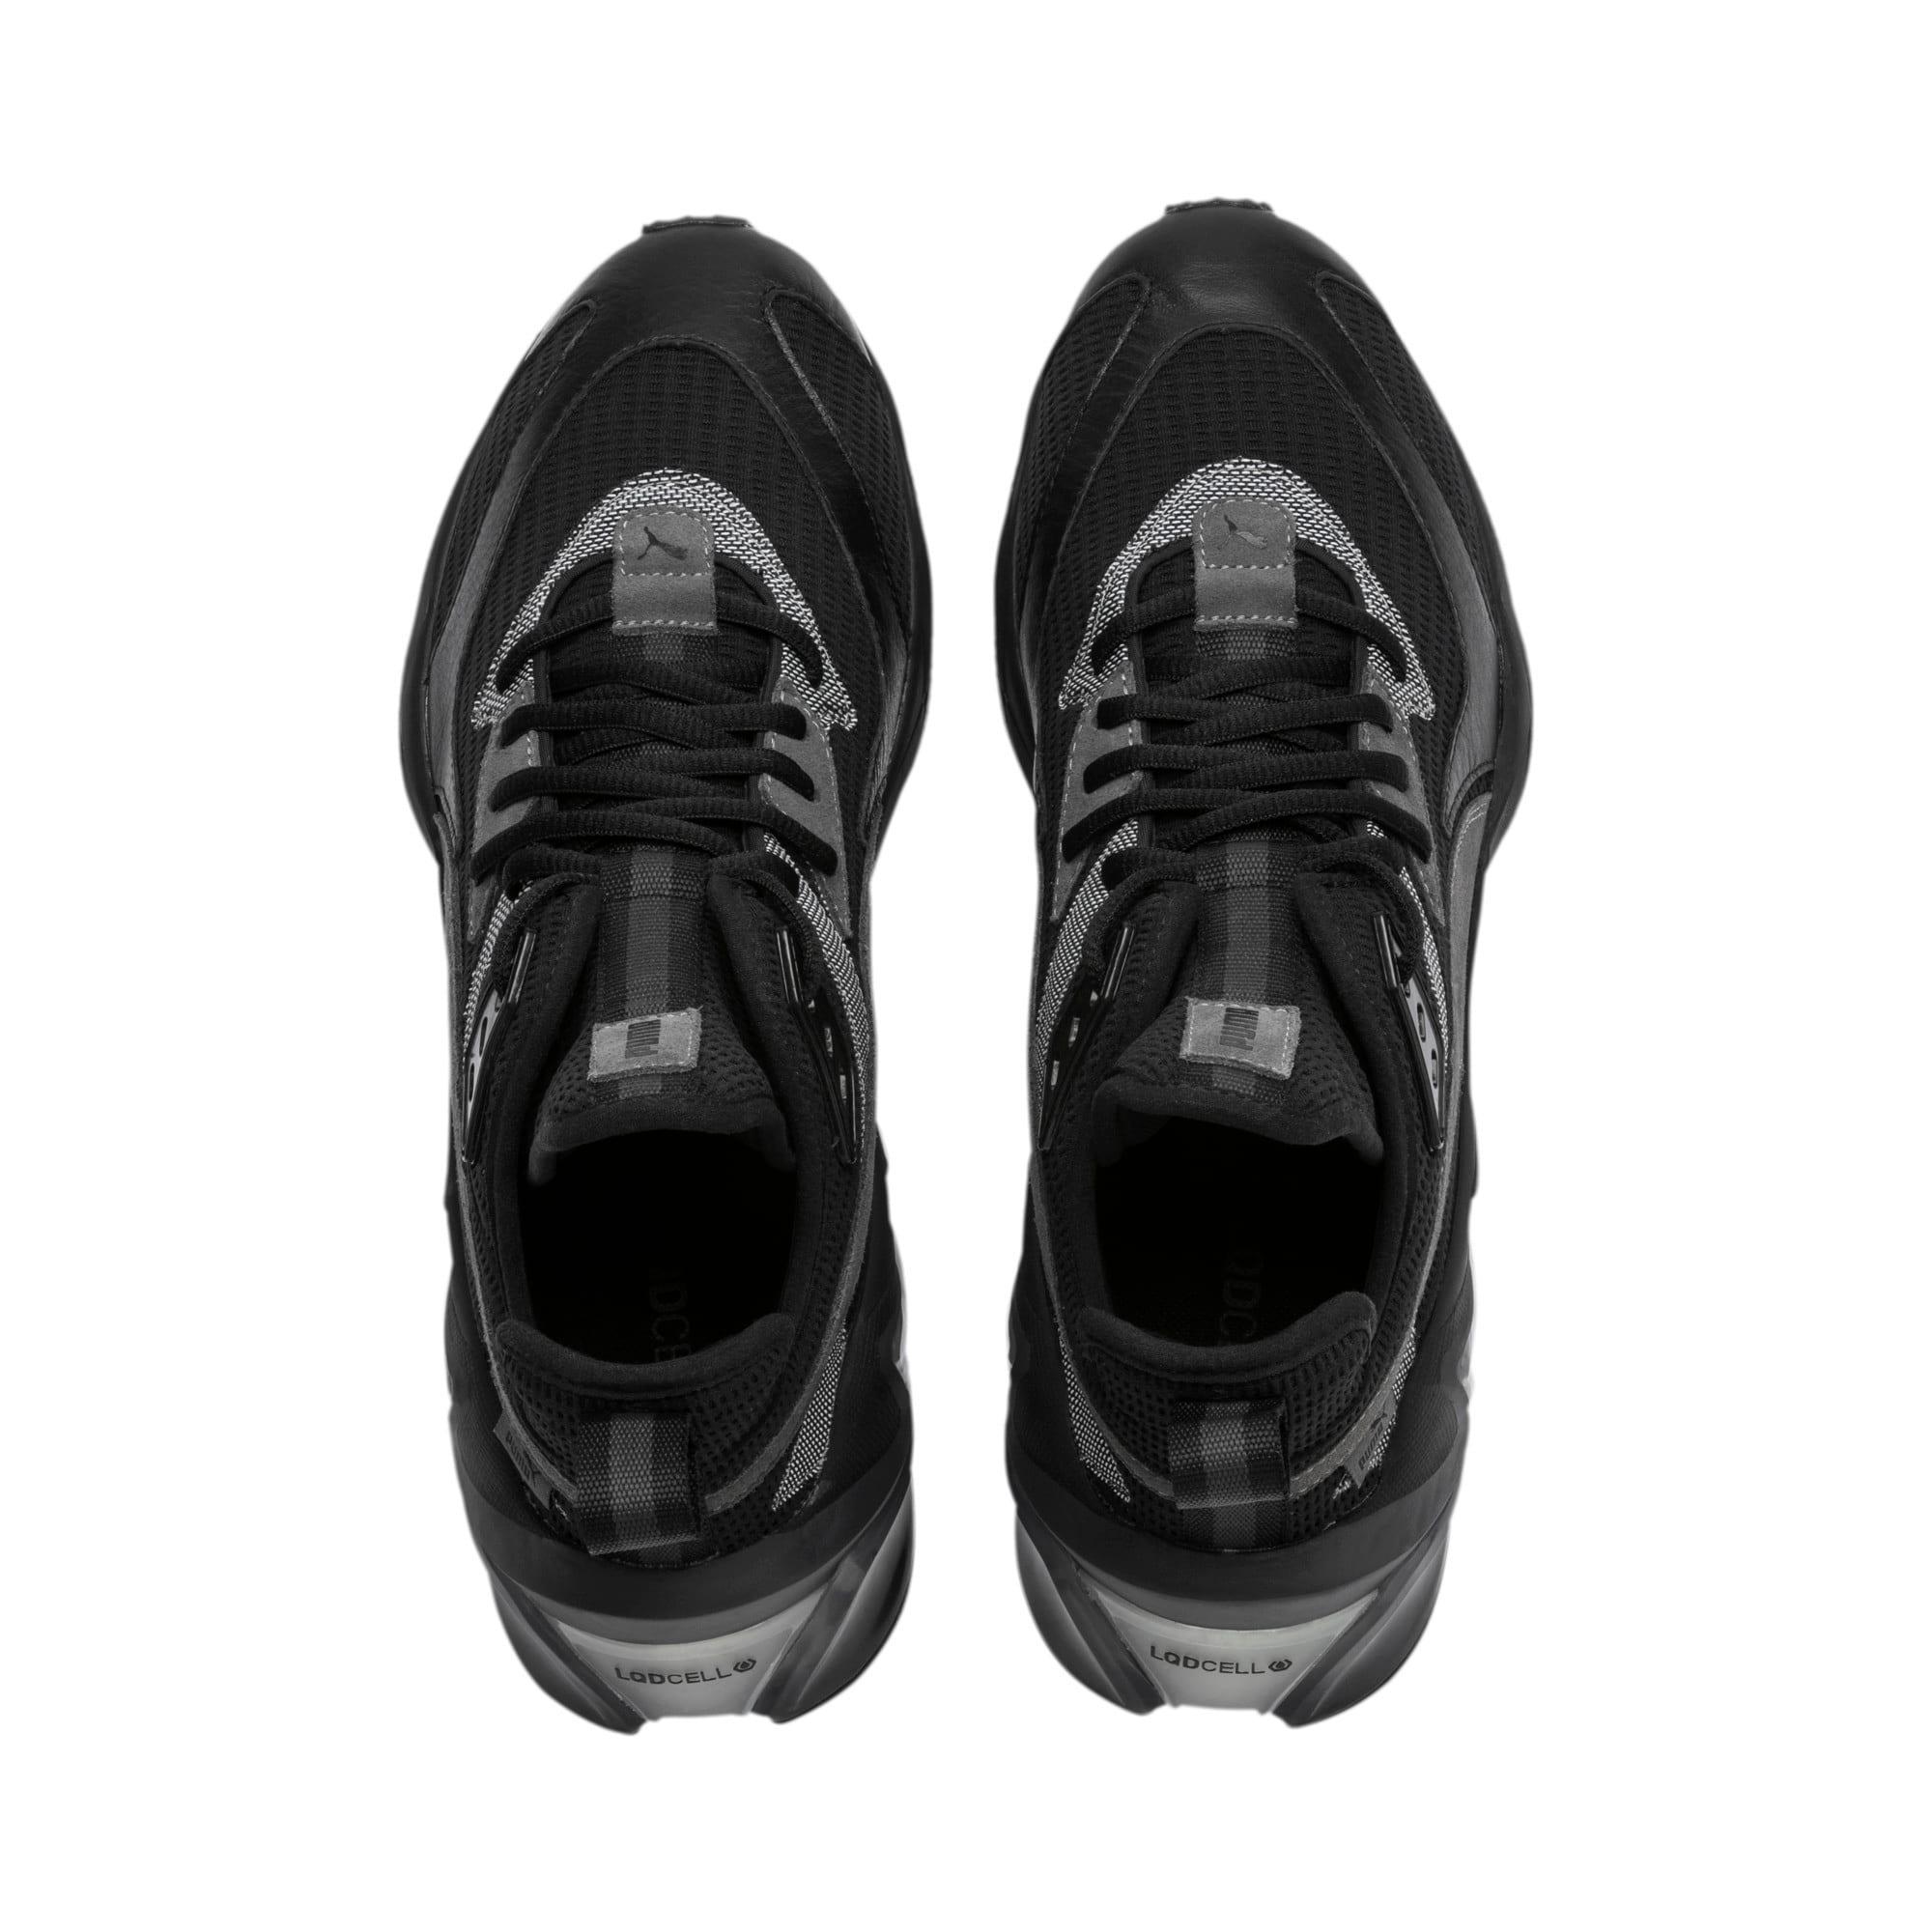 Thumbnail 7 of LQDCELL Origin Men's Training Shoes, Puma Black-Asphalt, medium